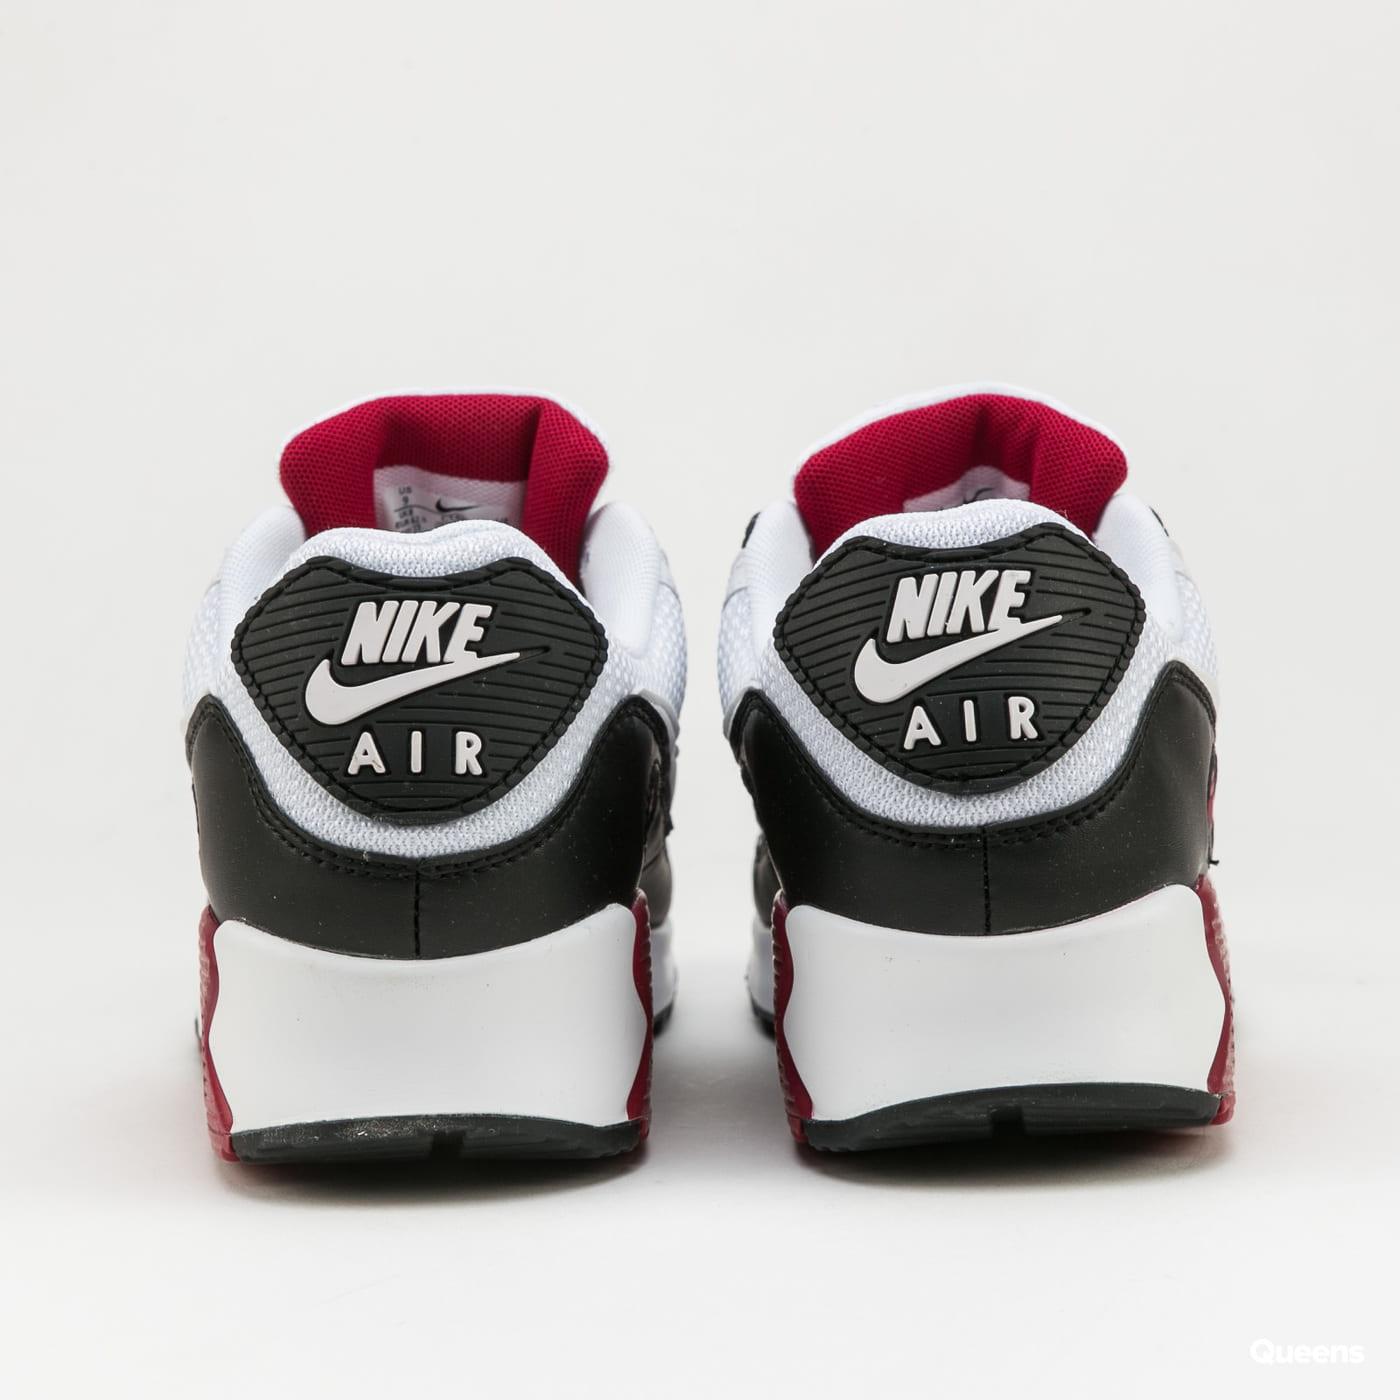 Nike Air Max 90 white / white - new maroon - black